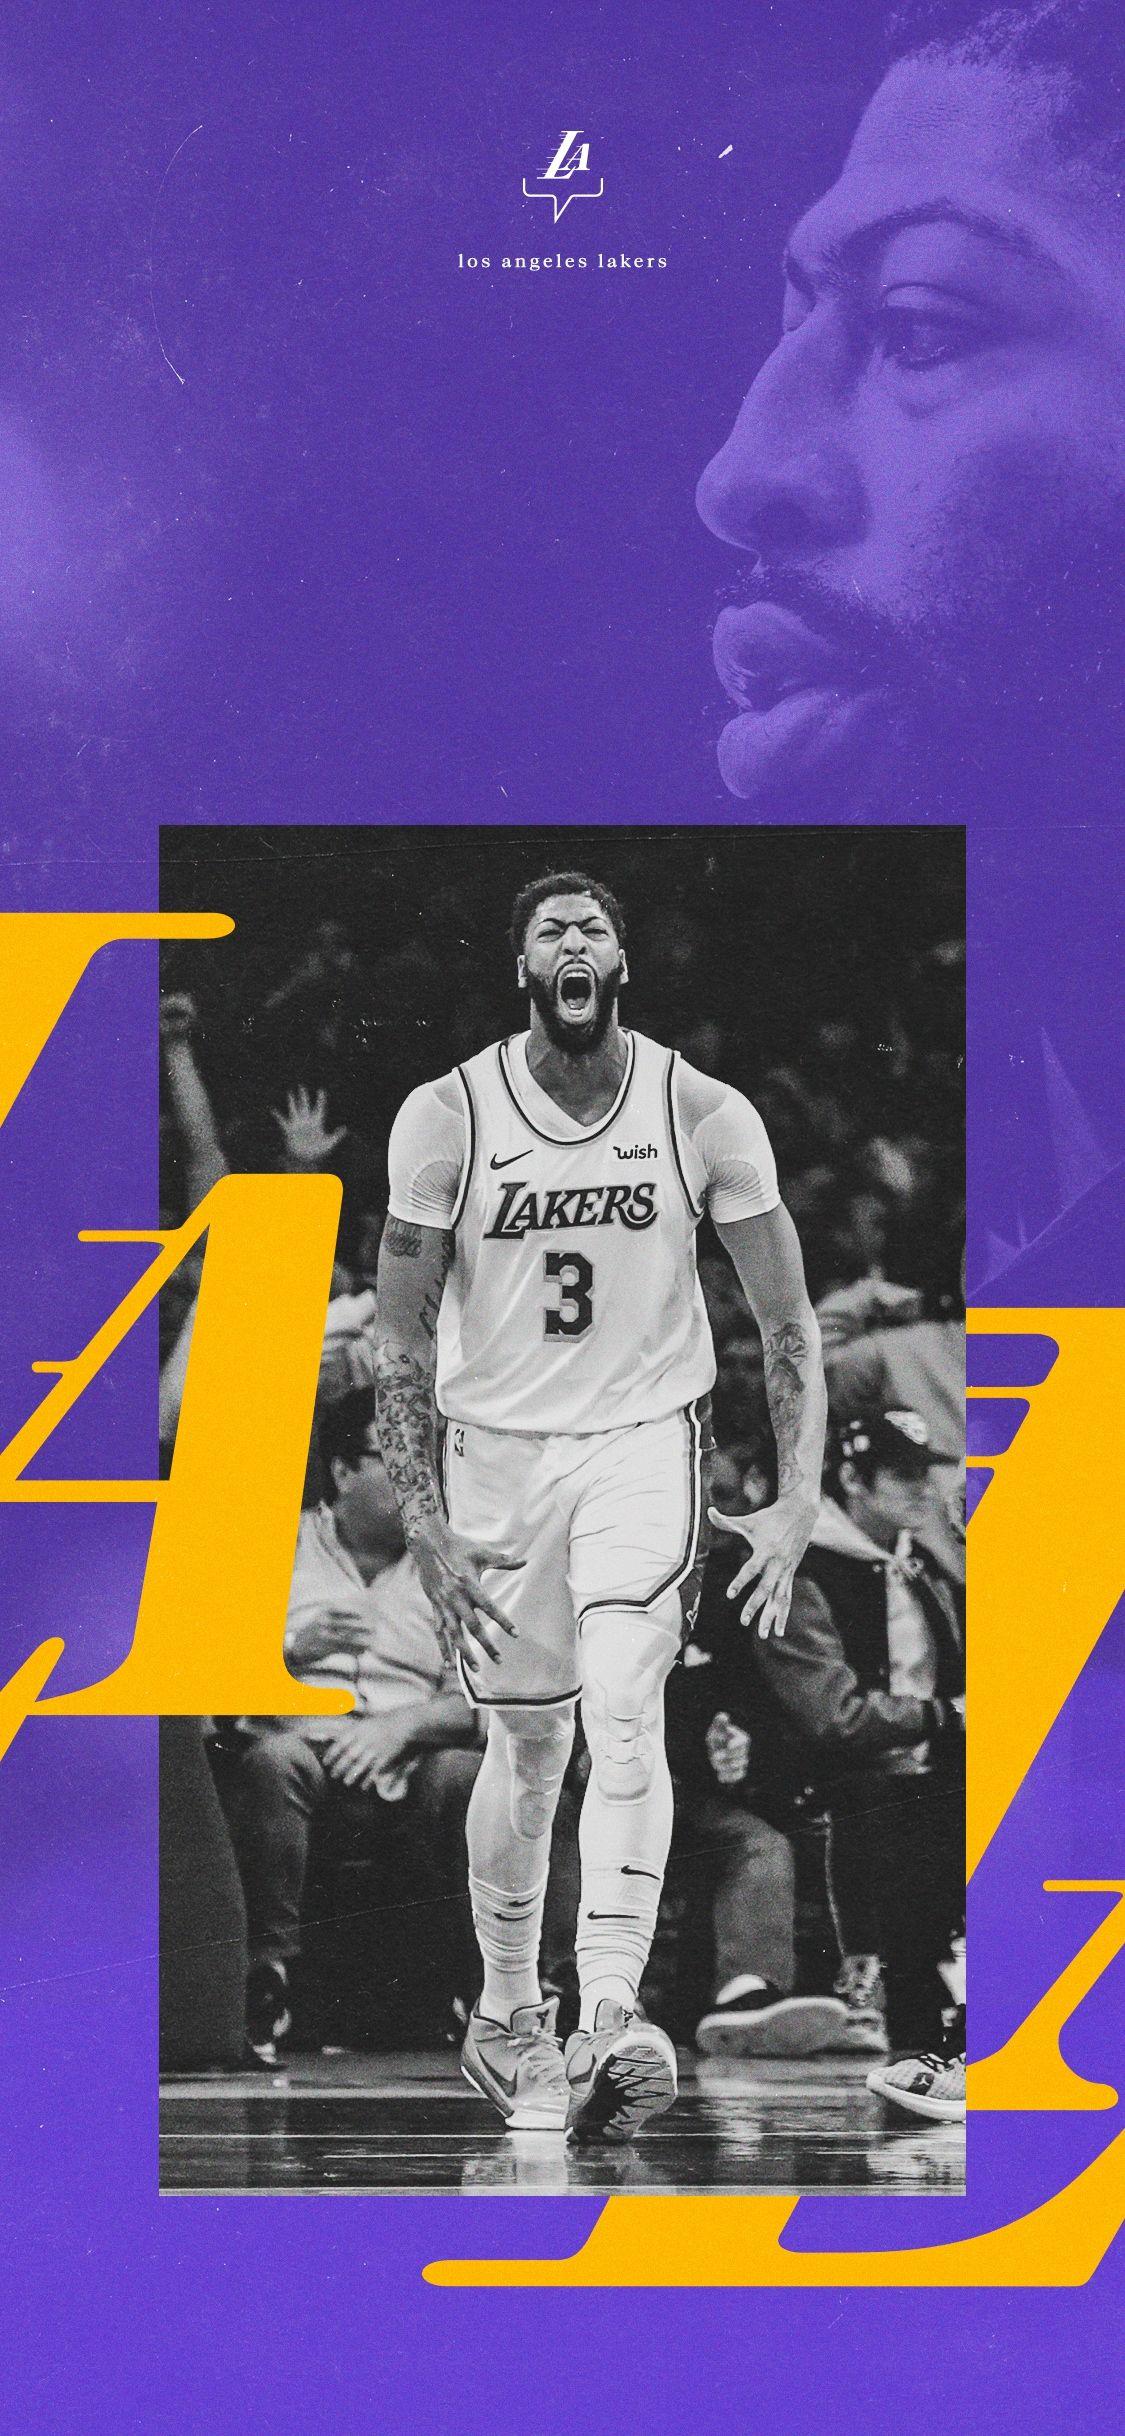 Los Angeles Lakers NBA Champions 2020 Wallpapers - Wallpaper Cave